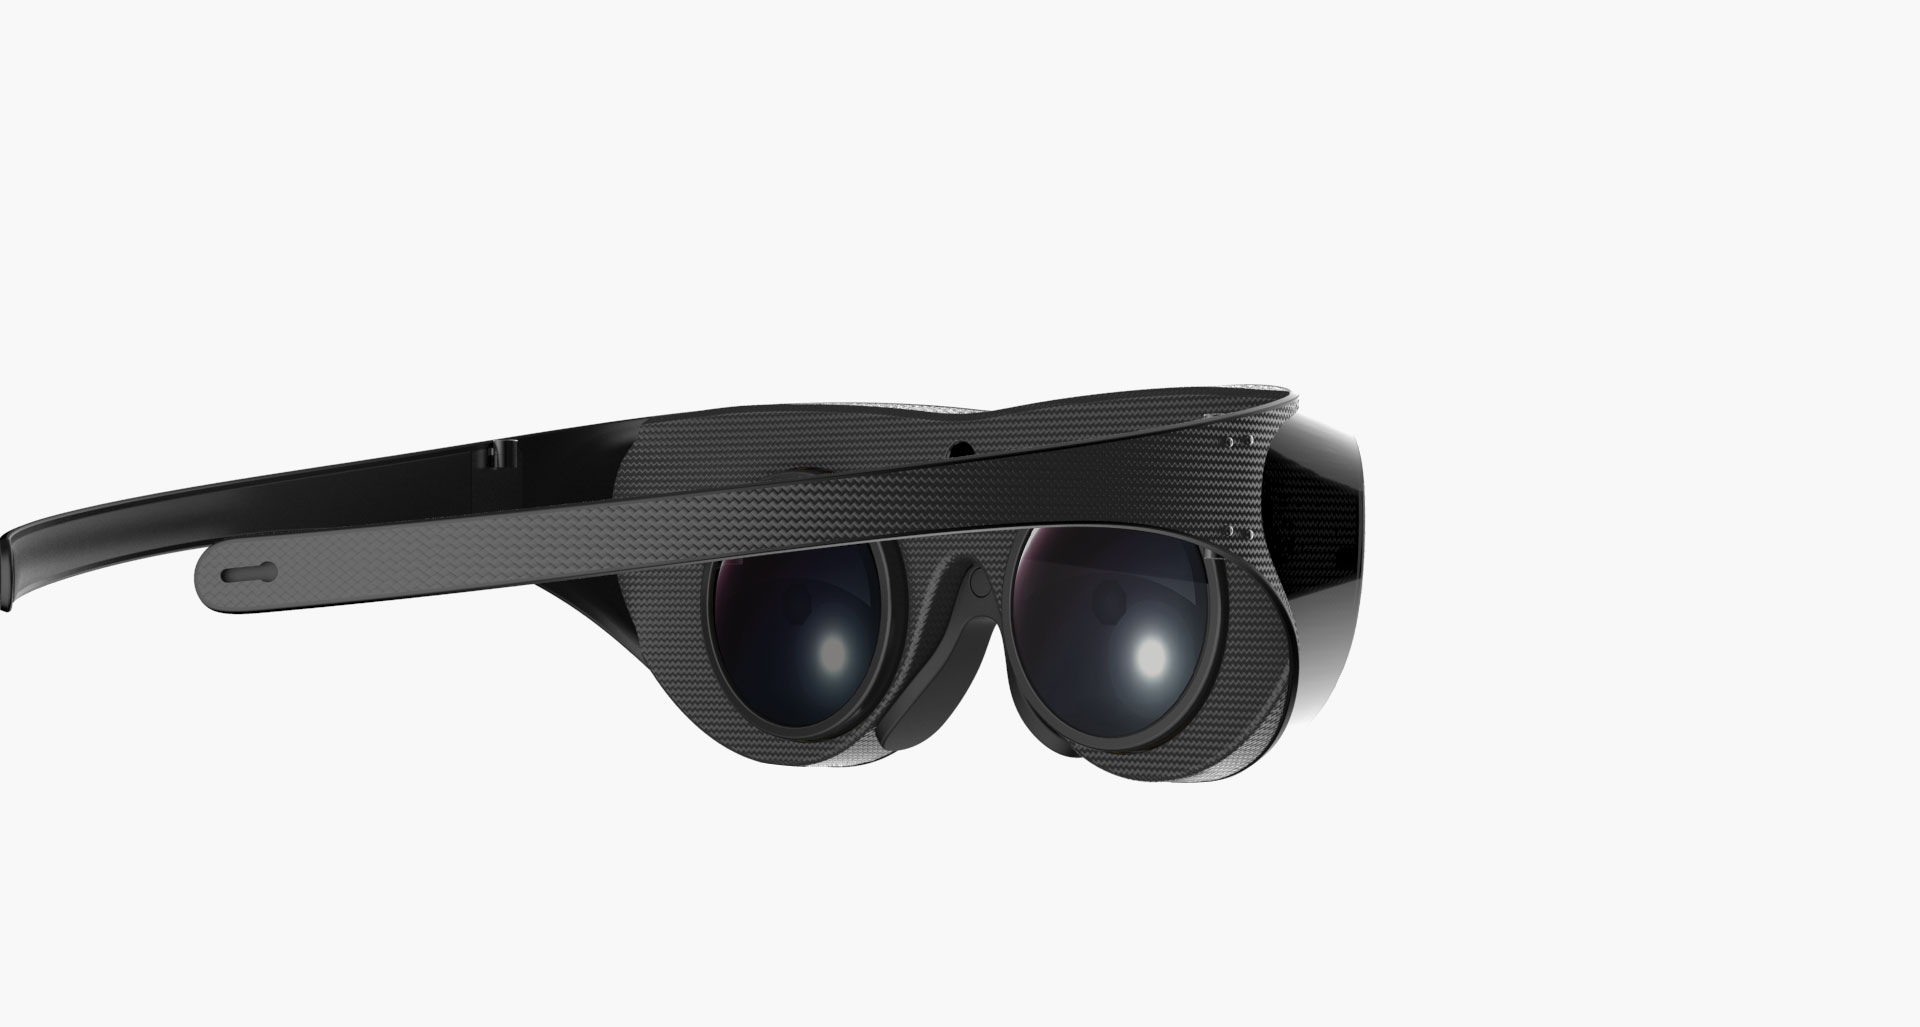 v1_bis_lunettes_realite_virtuelle.jpg